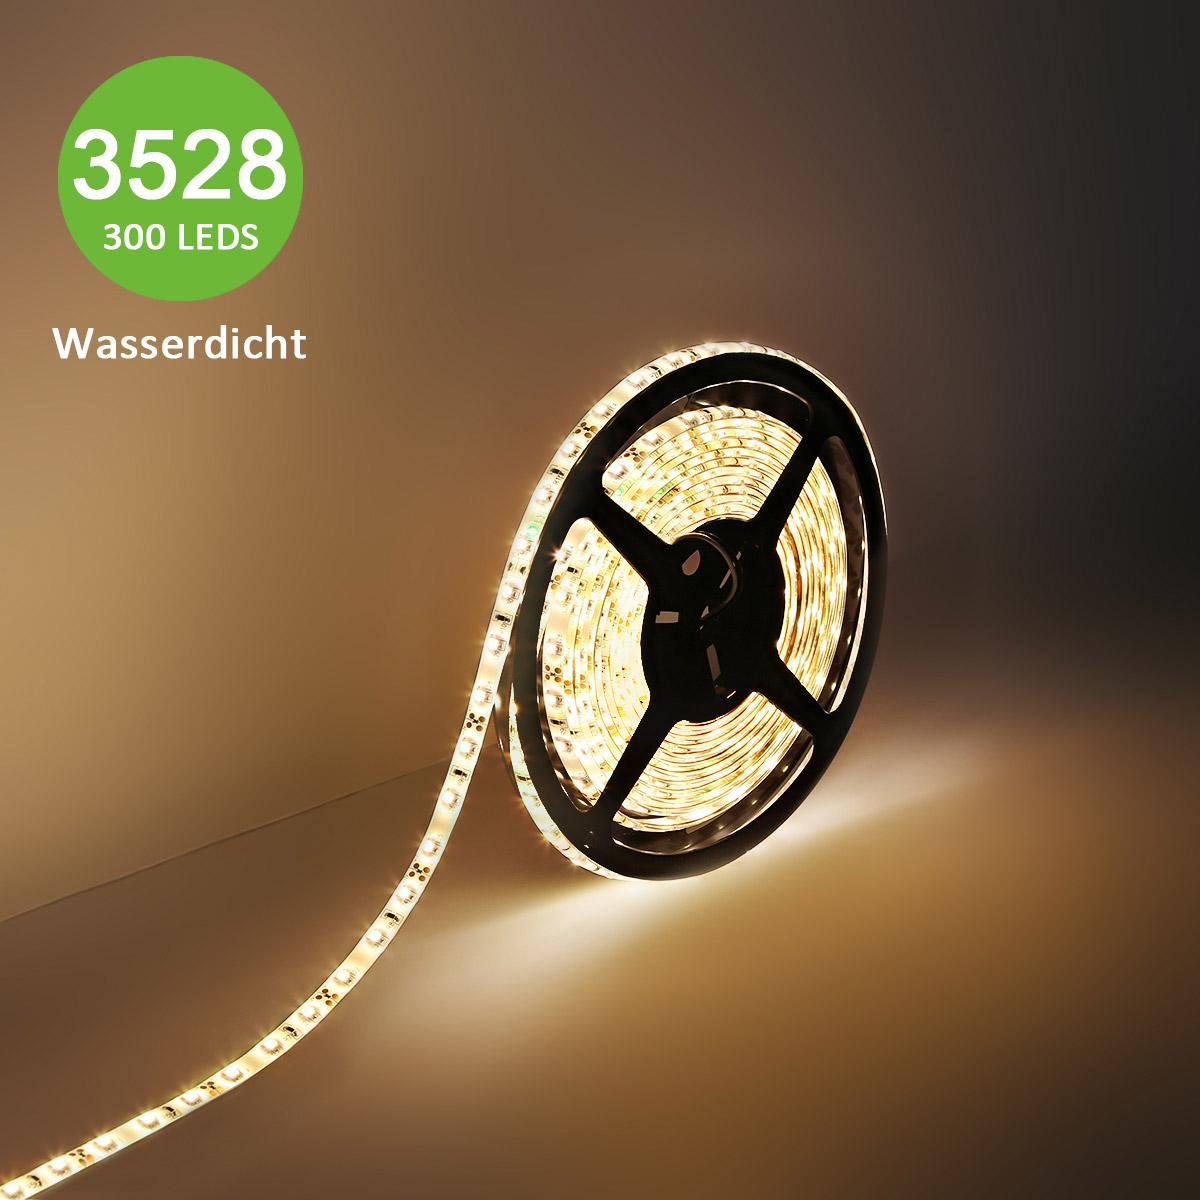 12V LED Lichtband, Dimmbar 300lm/Meter, Wasserfest, 3528 SMD LED Leiste, Warmweiß, 5M Indirekte Beleuchtung